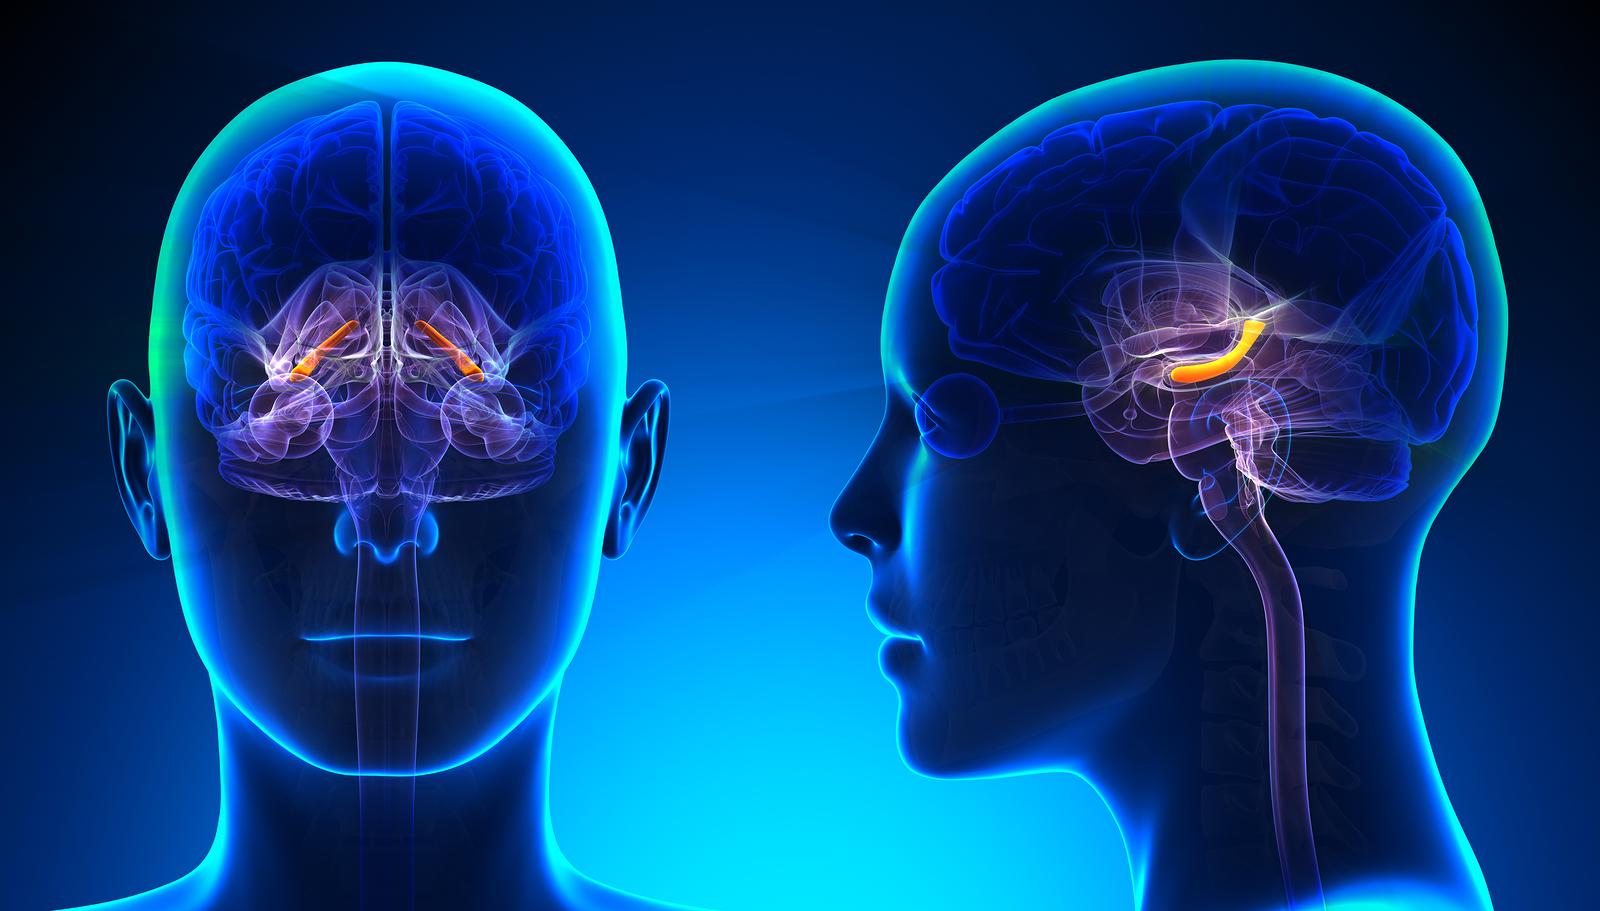 Female Hippocampus Brain Anatomy – Blue Concept